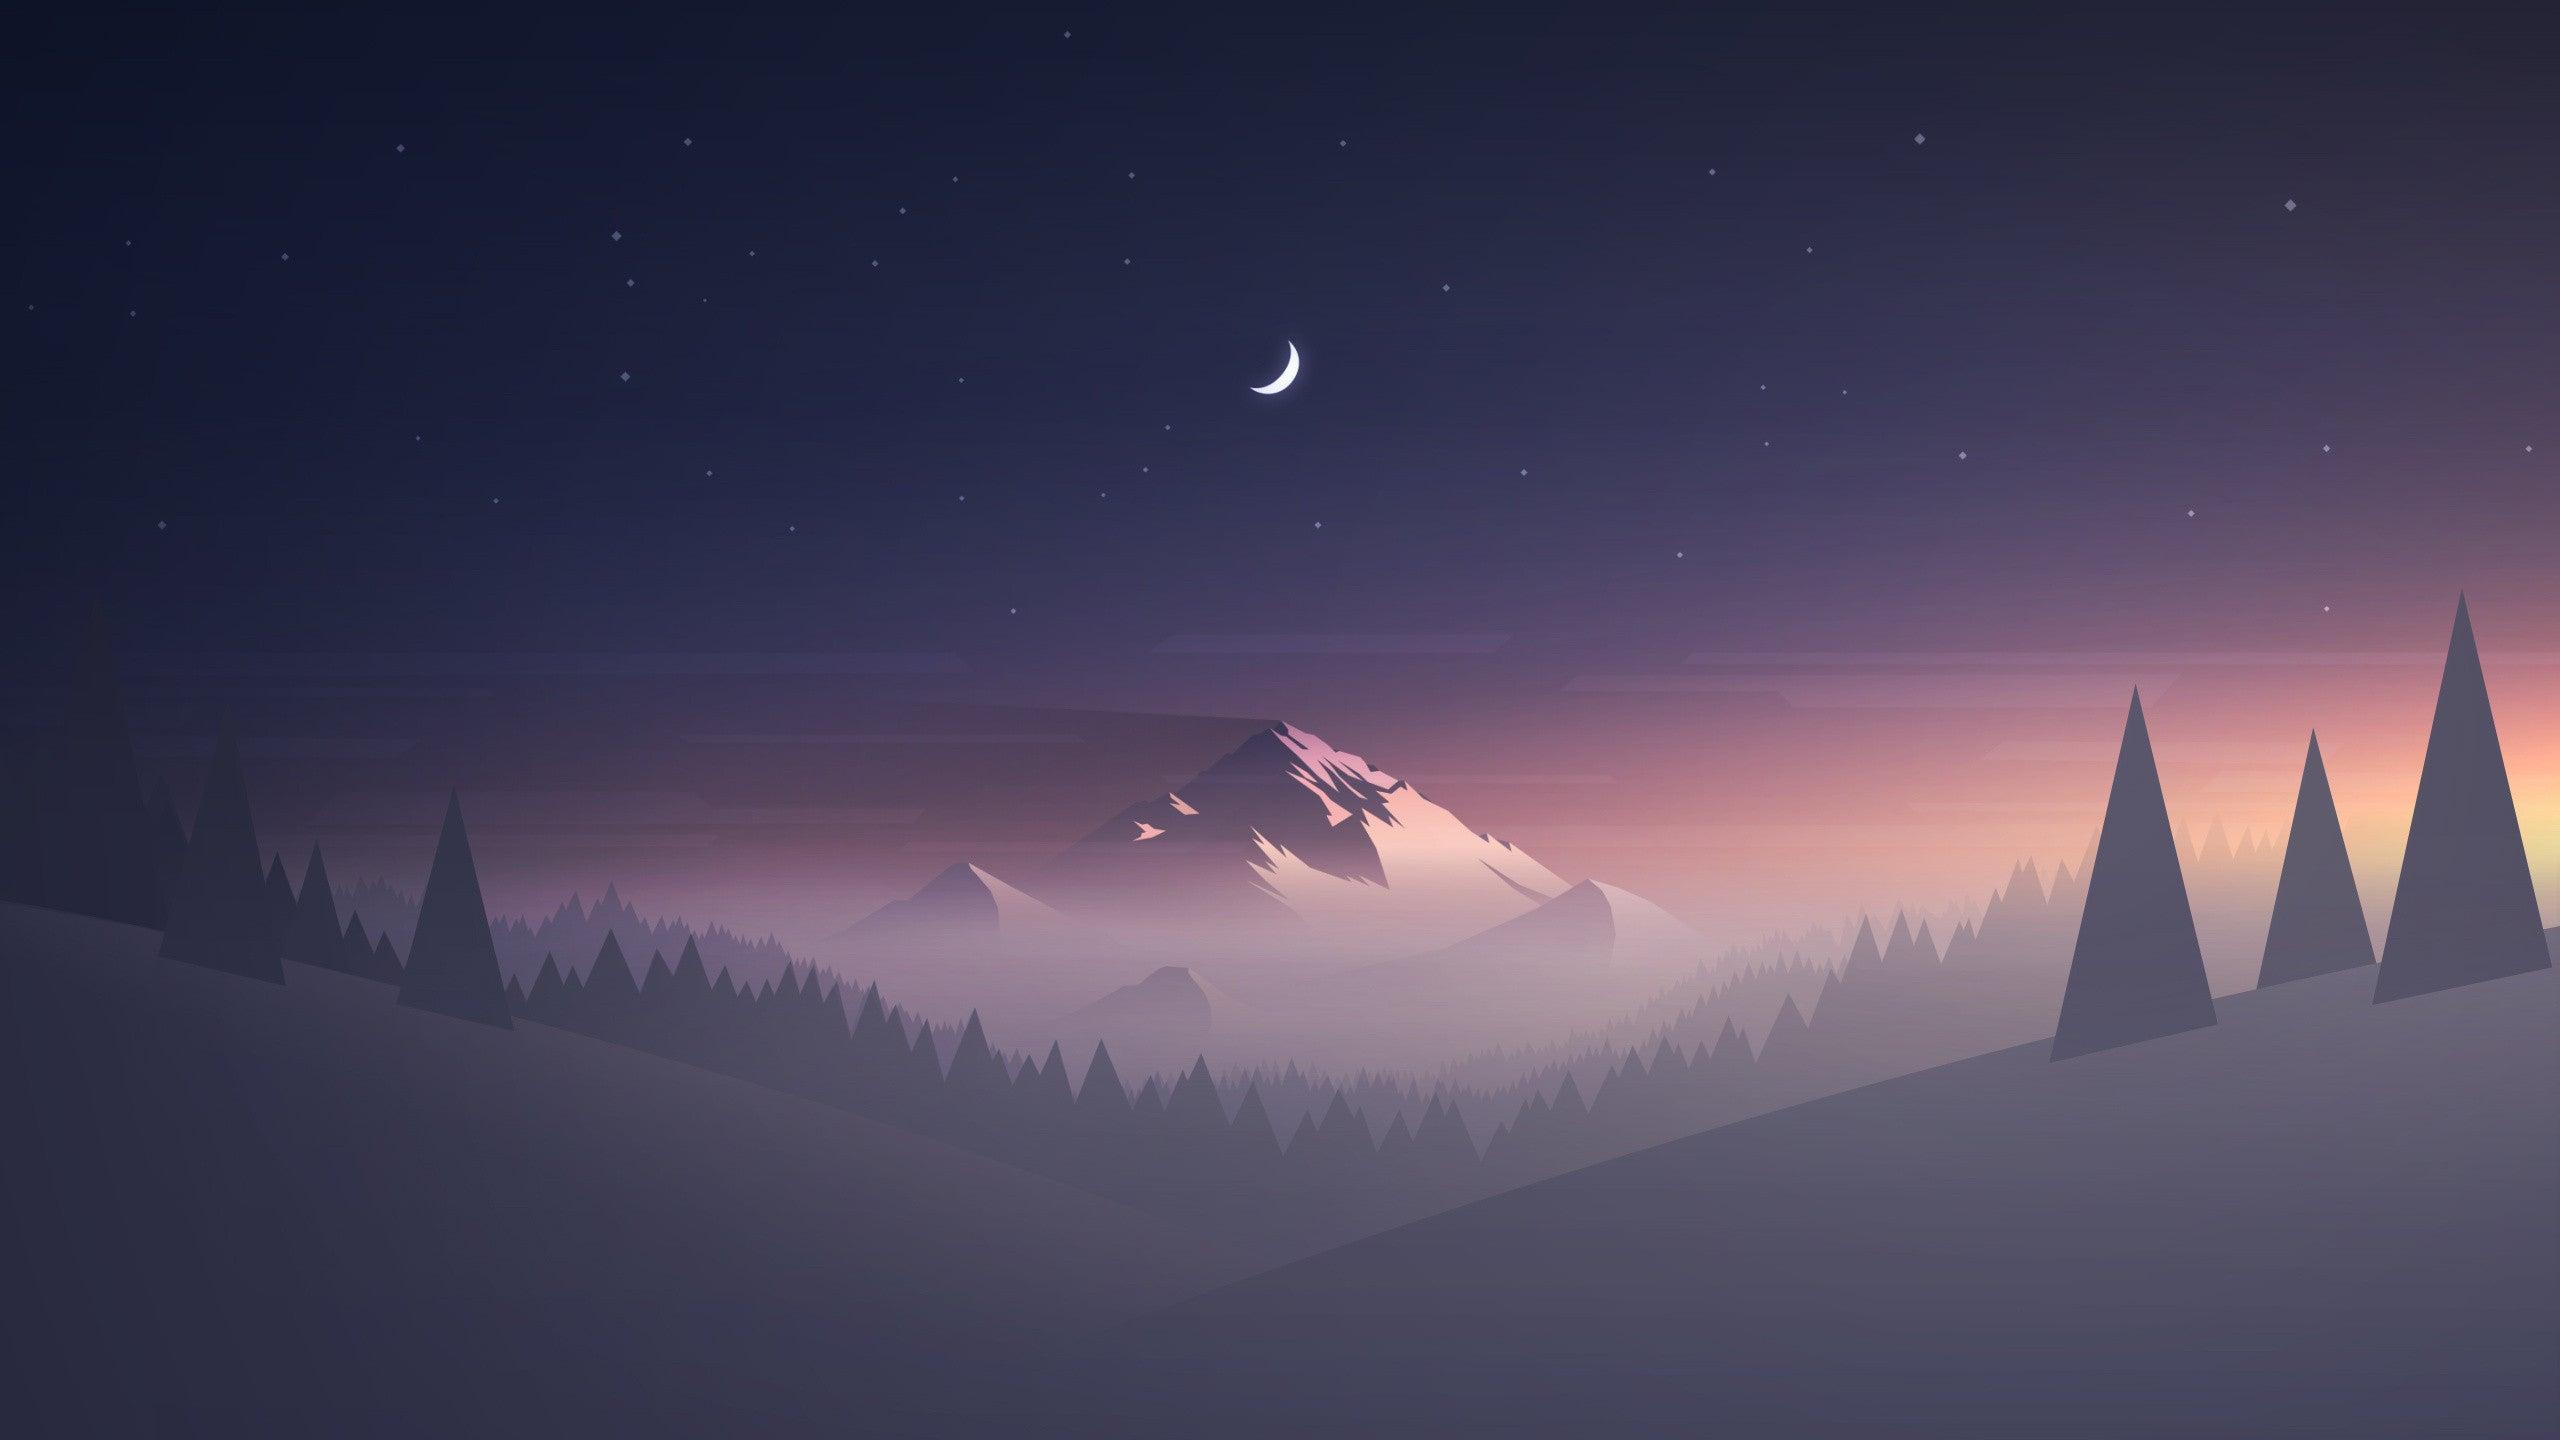 Minimal Landscape Hd Wallpaper